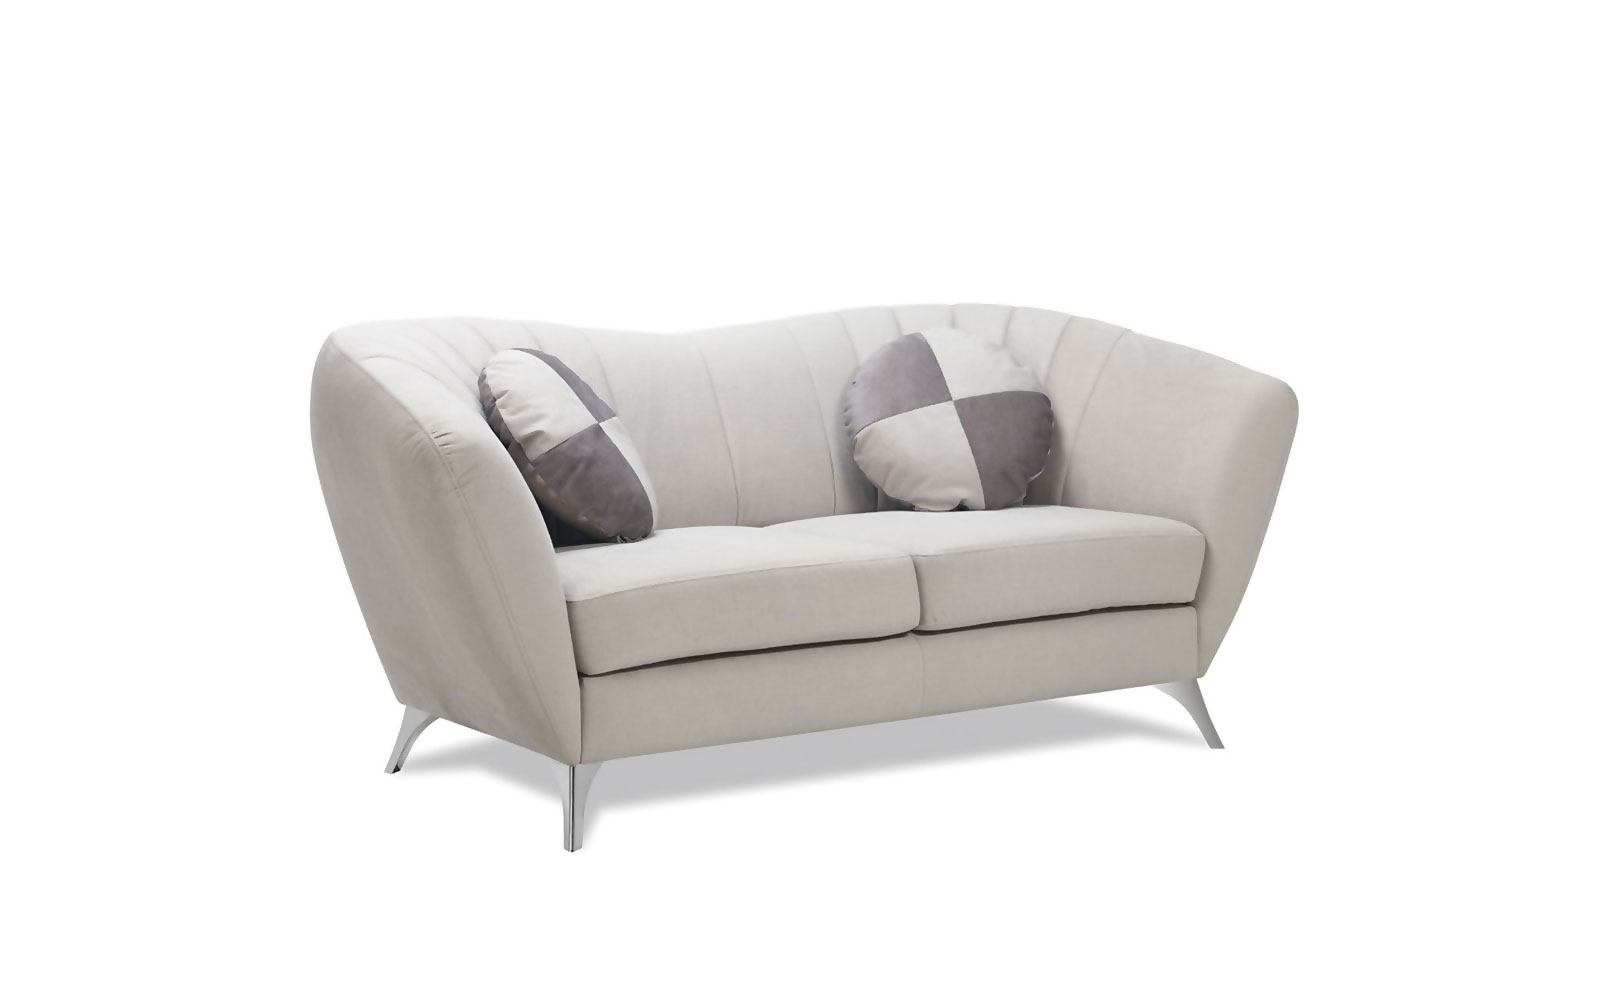 Canapea fixa 2 locuri Vittorio, l190xA100xH85 cm